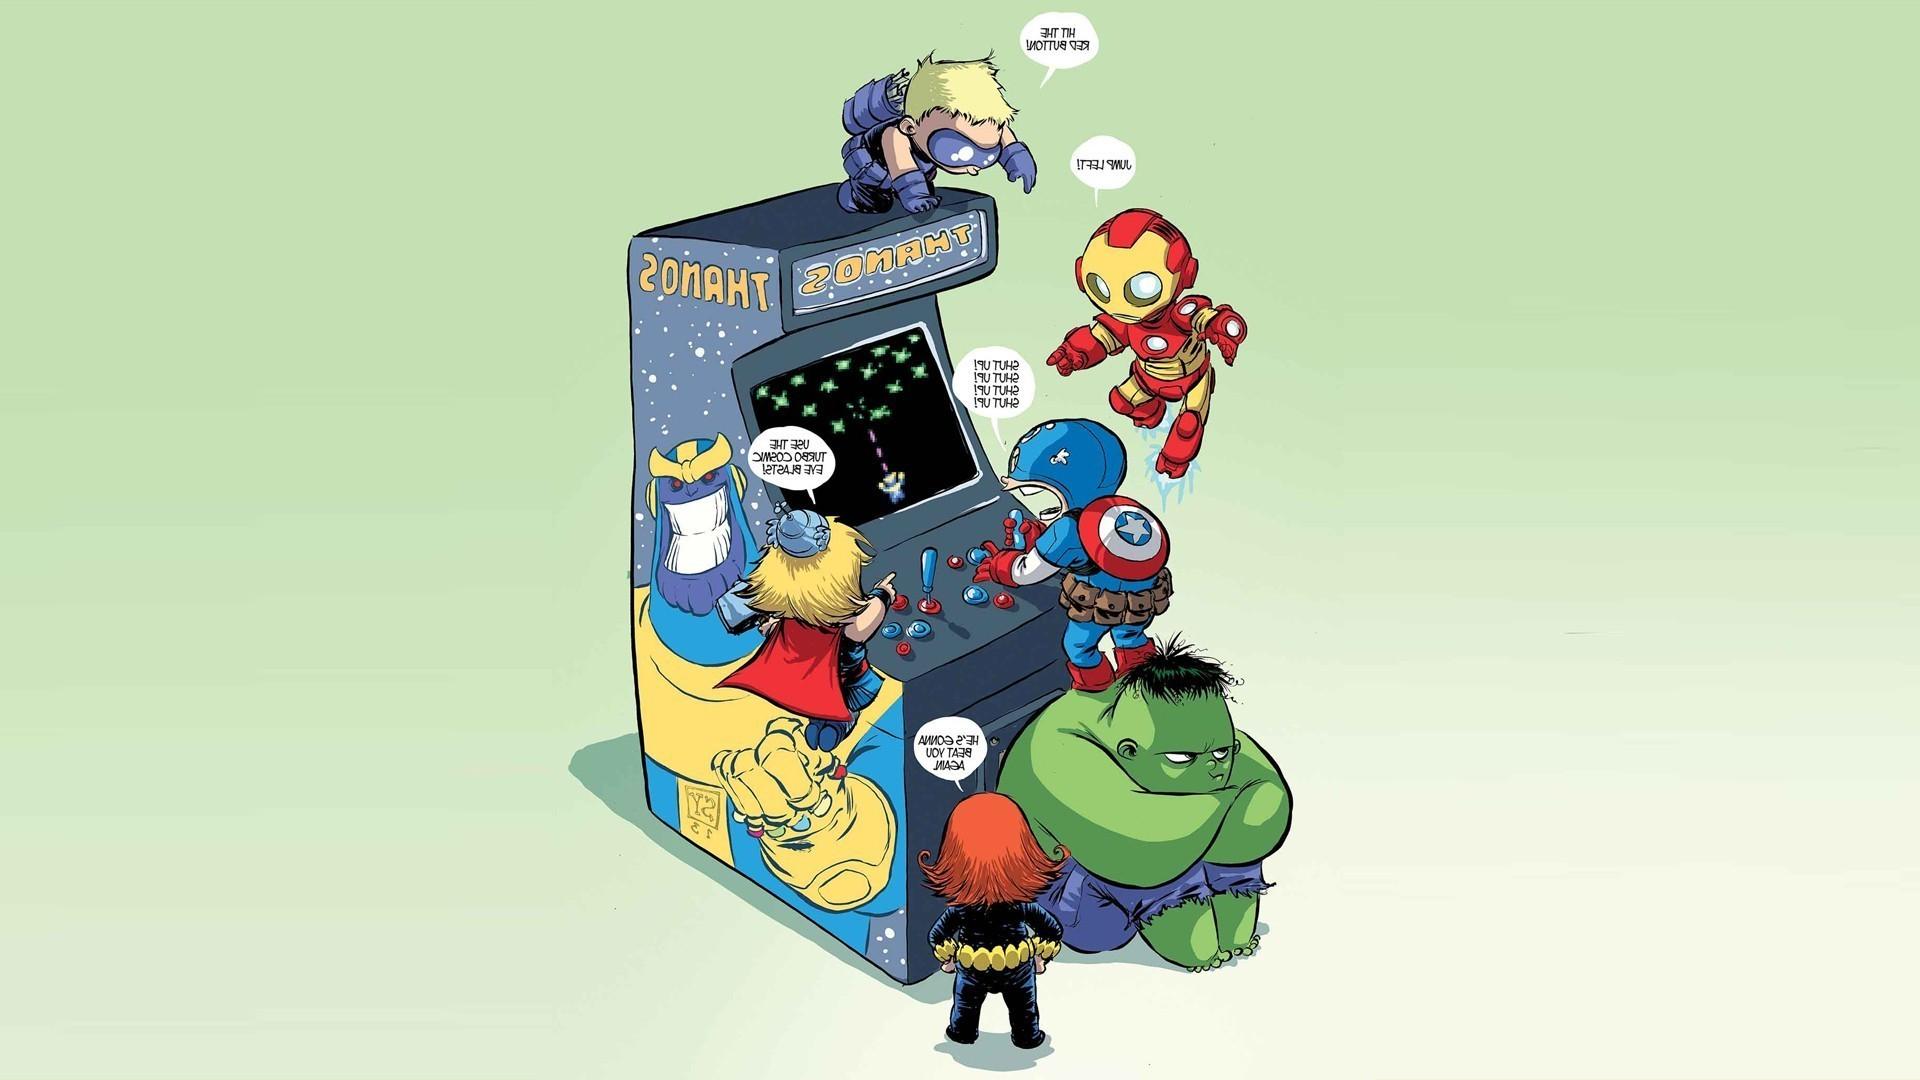 Marvel Comics, Movies, Marvel Heroes, Iron Man, Stark Industries, Hulk,  Captain America, Thor, Thanos, Arcade Cabinet, The Avengers Wallpapers HD /  Desktop …